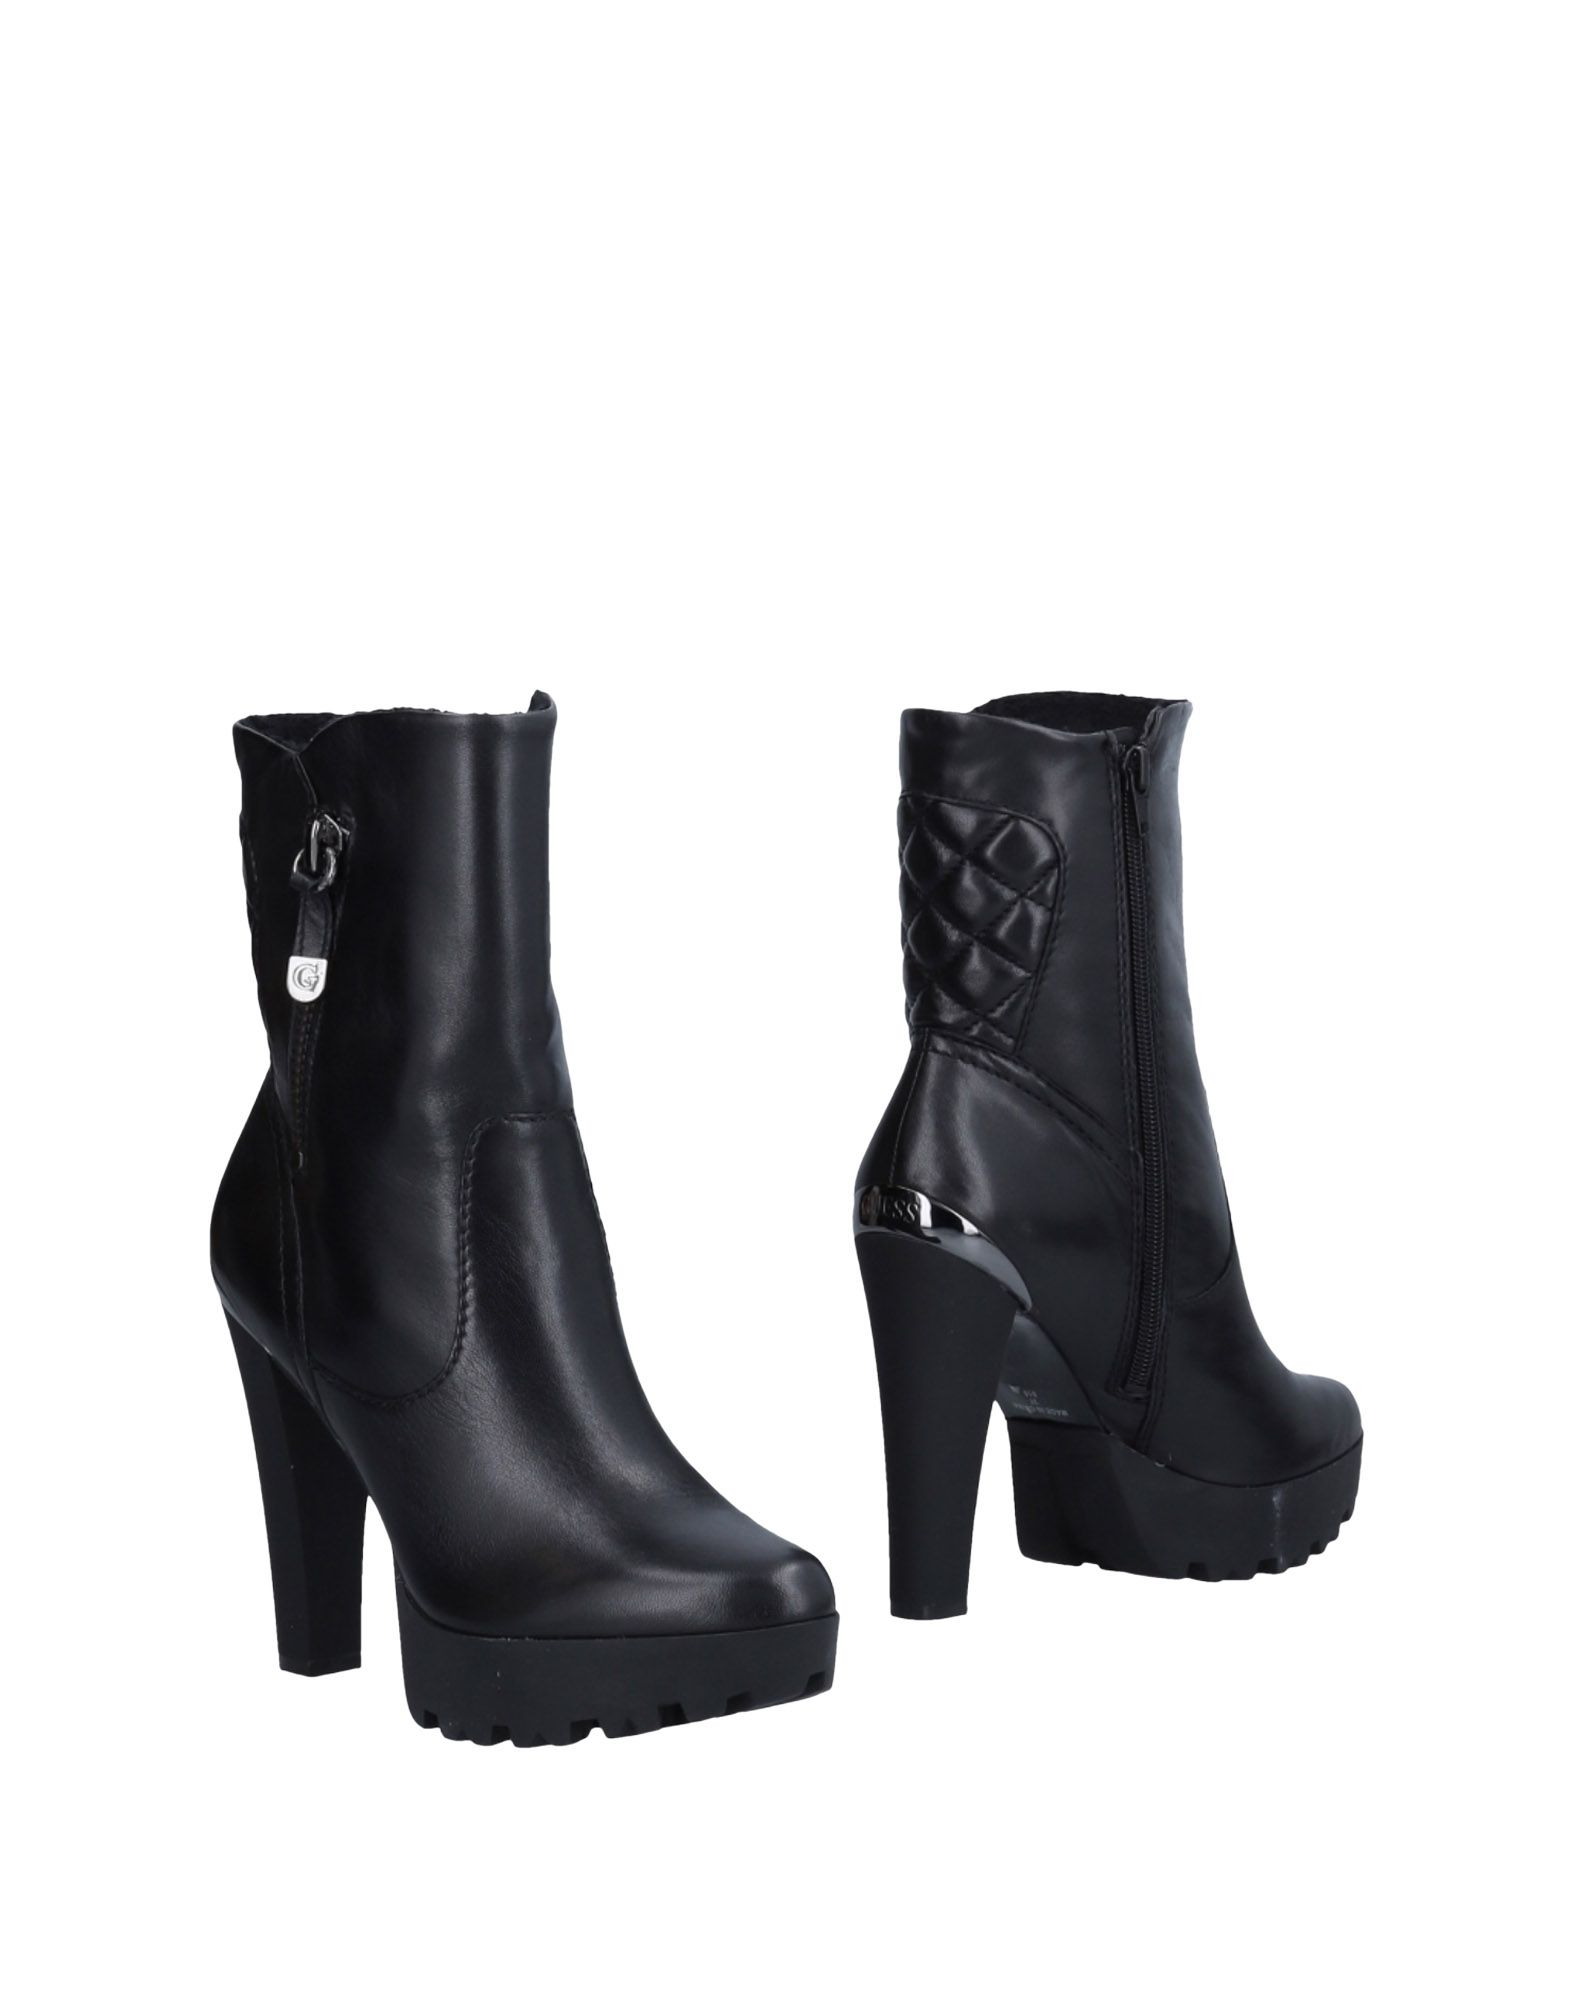 Guess Stiefelette Damen  11494211MK Heiße Heiße Heiße Schuhe 32e5cb